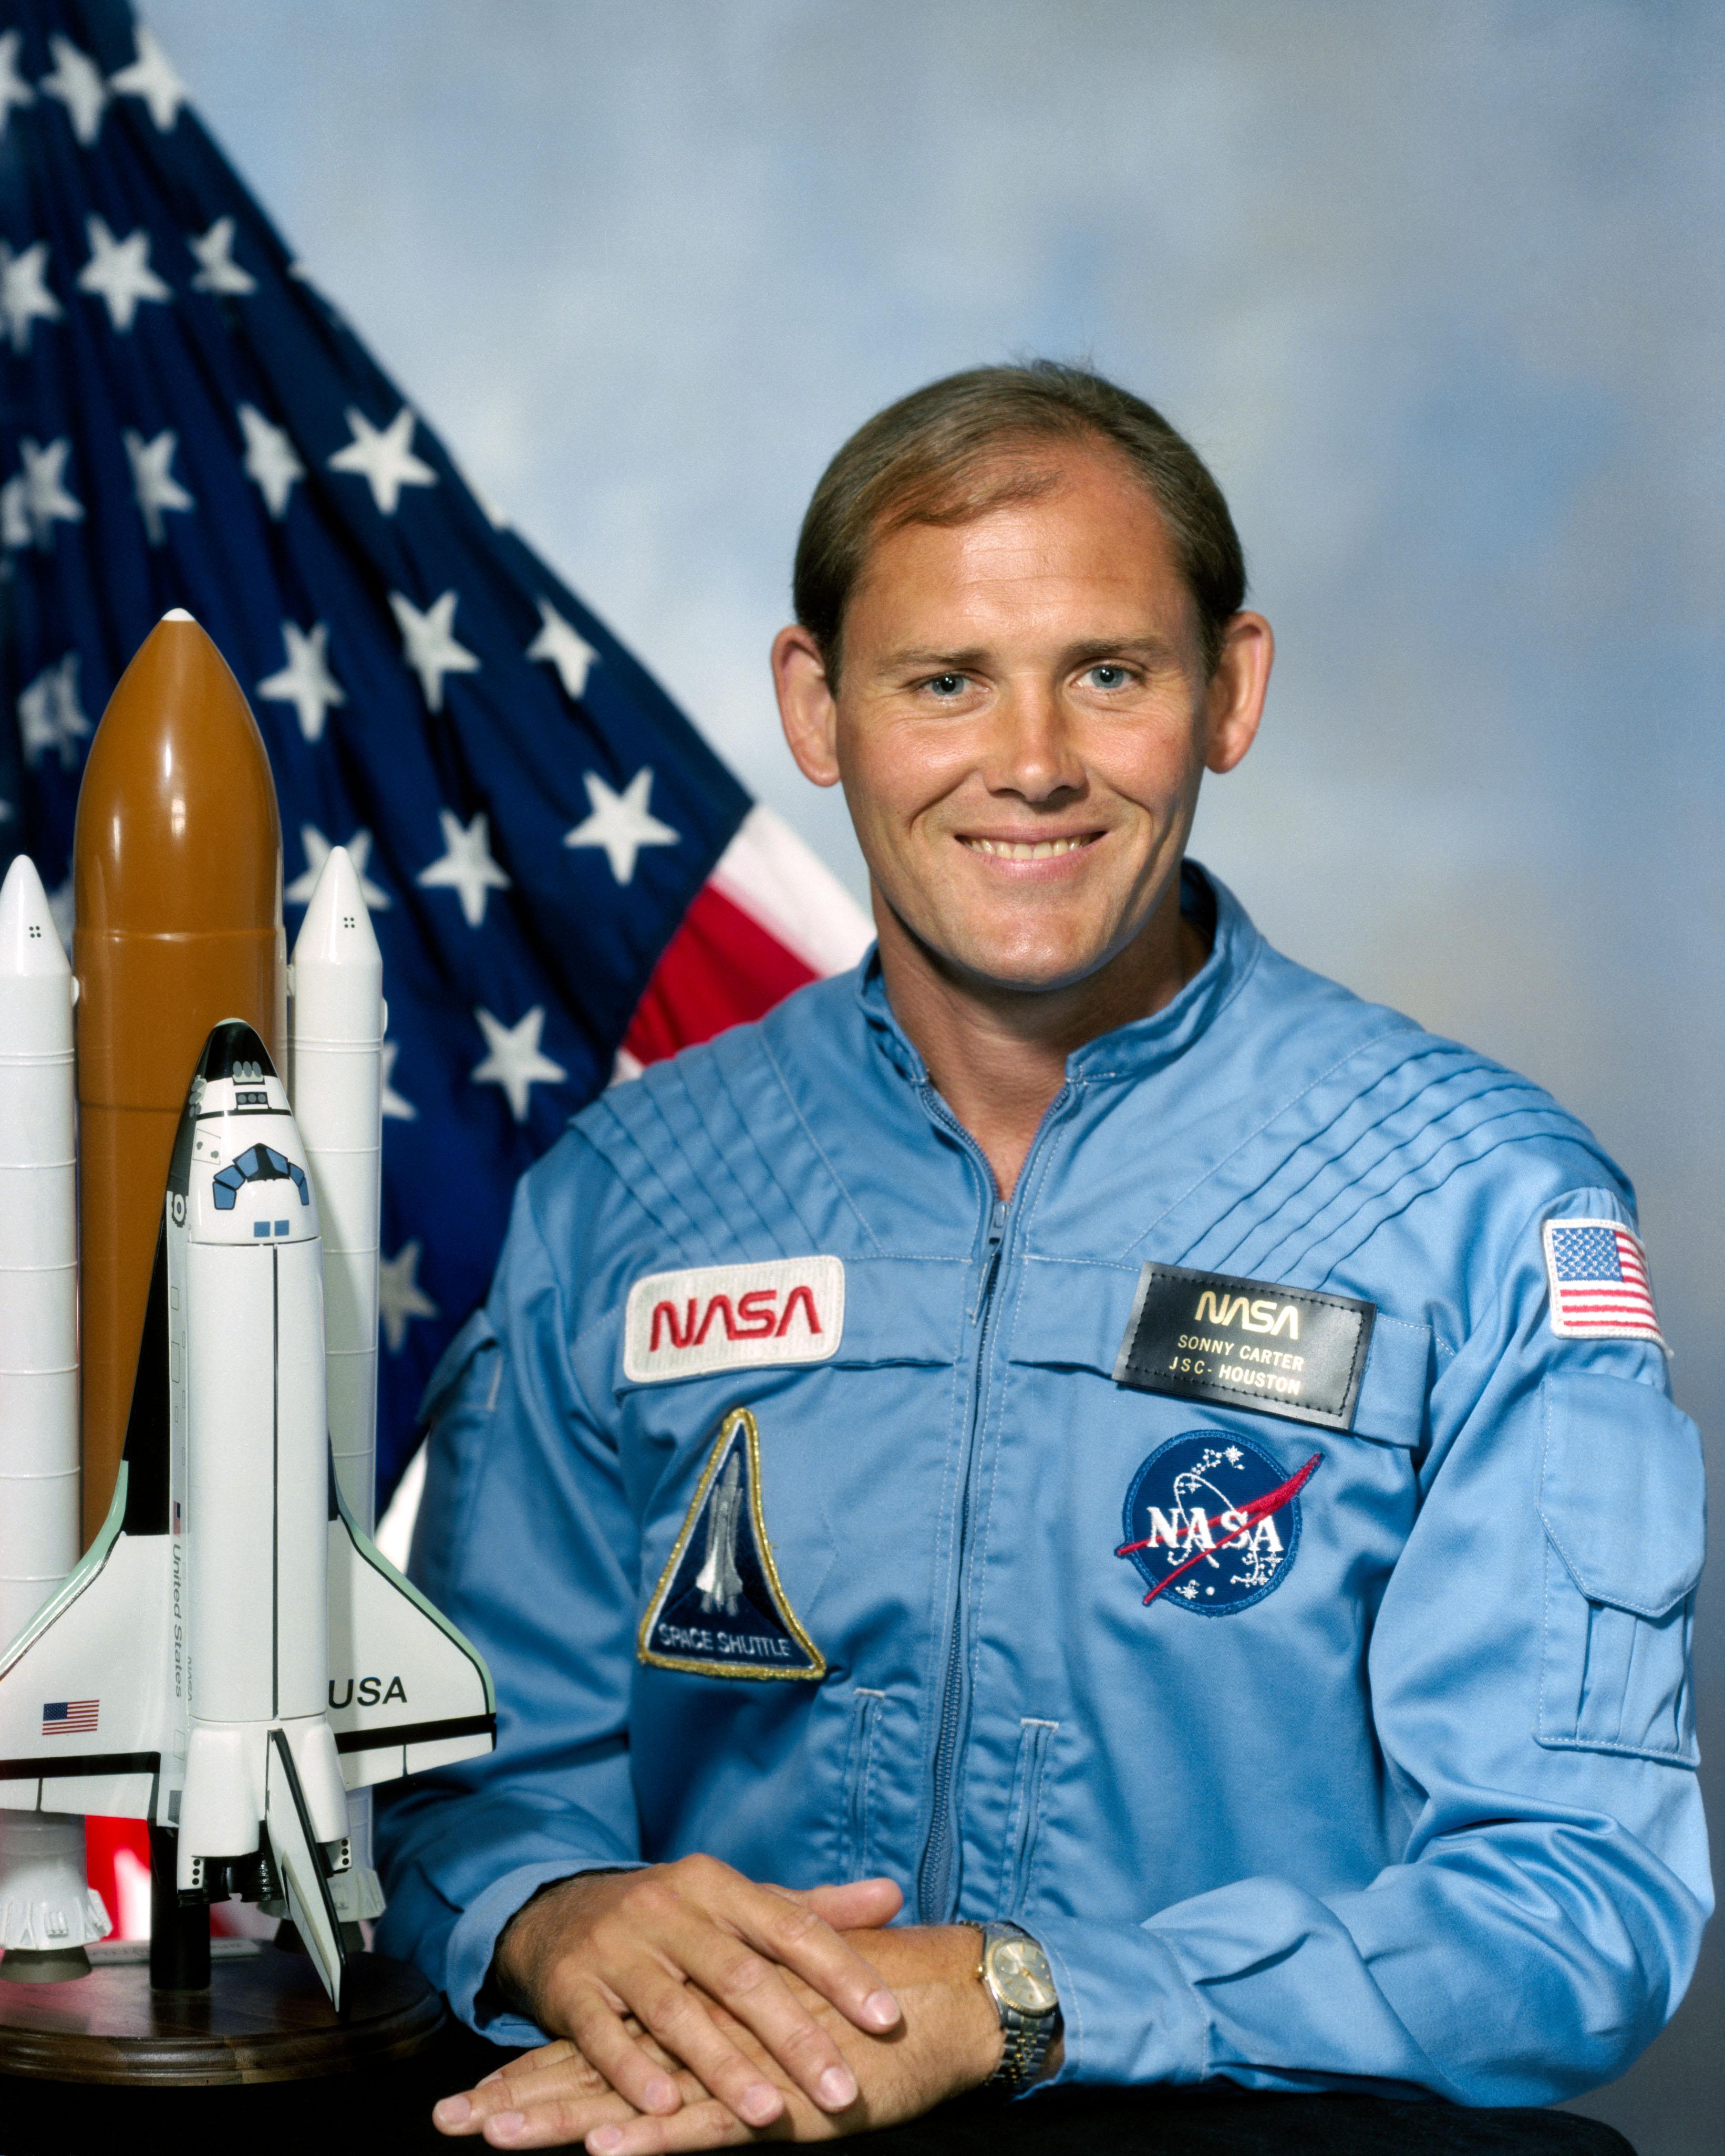 Astronaut Sonny Carter, NASA photo (24 August 1984)Source: Wikipedia (www.jsc.nasa.gov unavailable August 2019) Manley_Carter.jpg